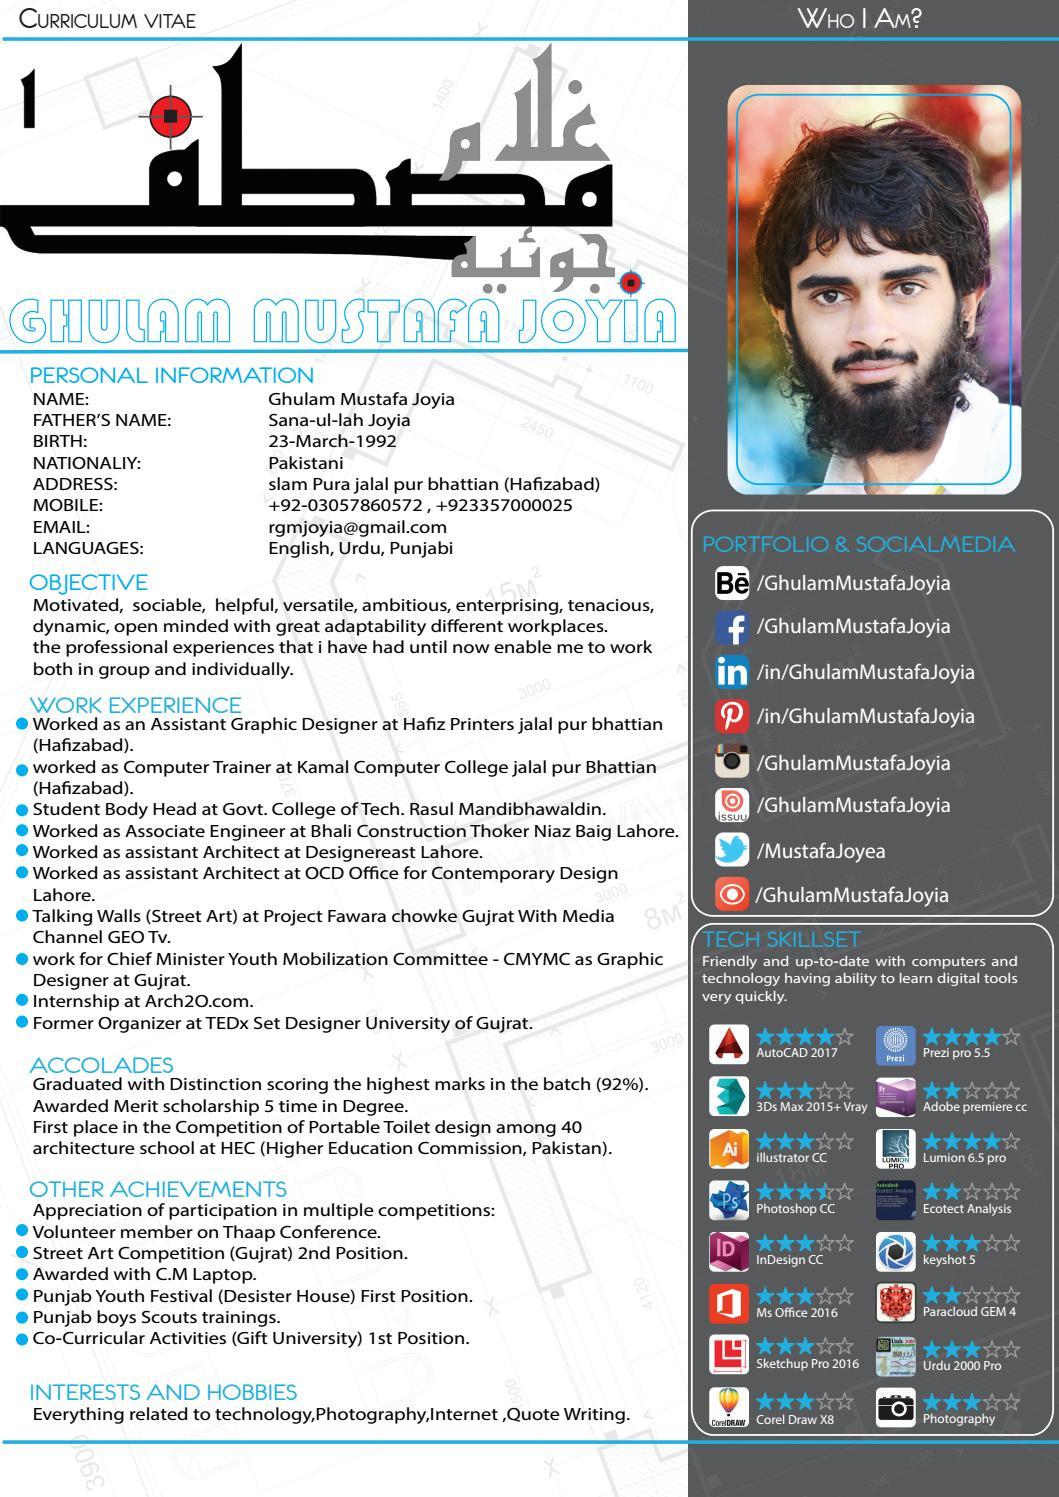 graduate architect cv ghulam mustafa joyia by muhammad ghulam mustafa joyia